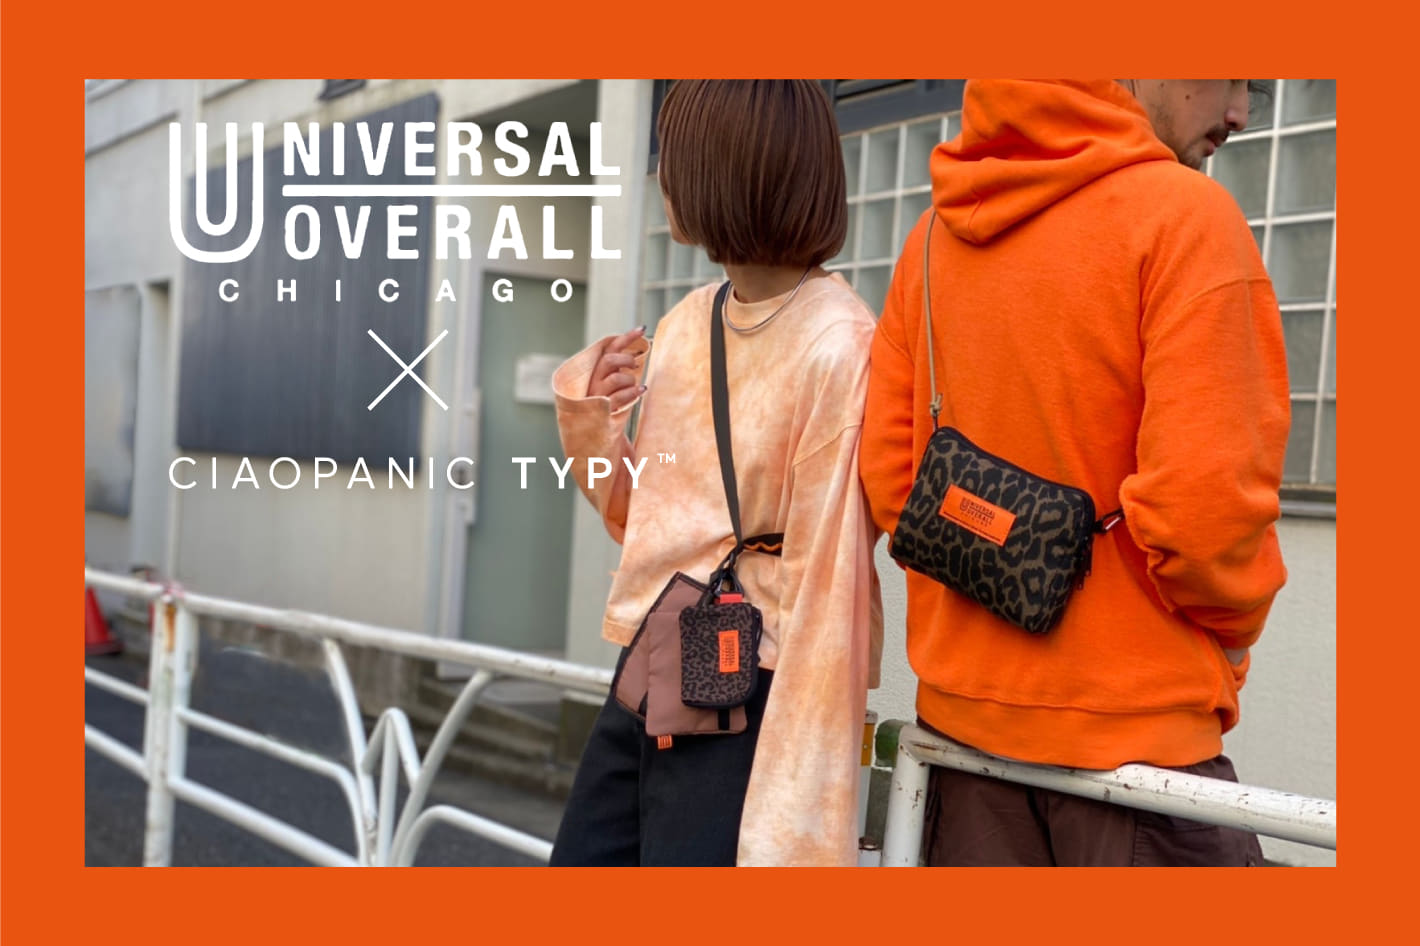 CIAOPANIC TYPY 【UNIVERSAL OVERALL×CIAOPANIC TYPY】予約販売開始!